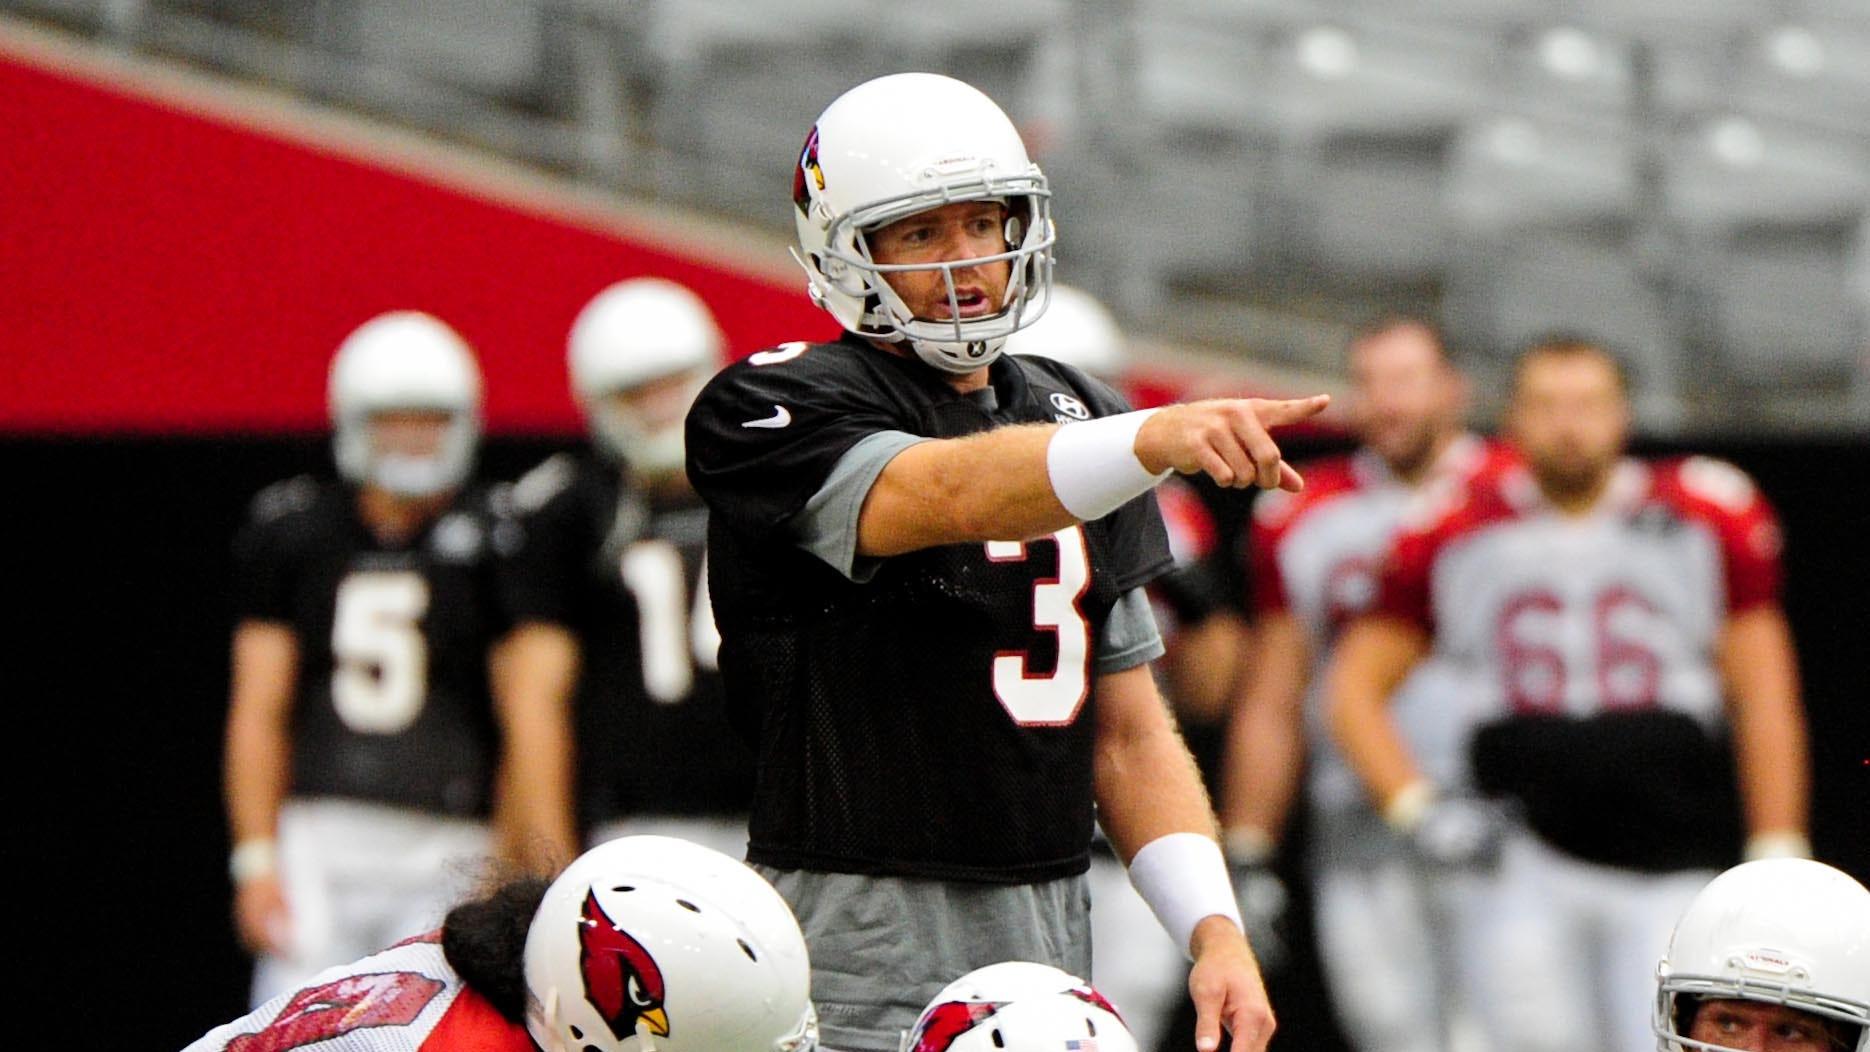 22. Carson Palmer, Arizona Cardinals